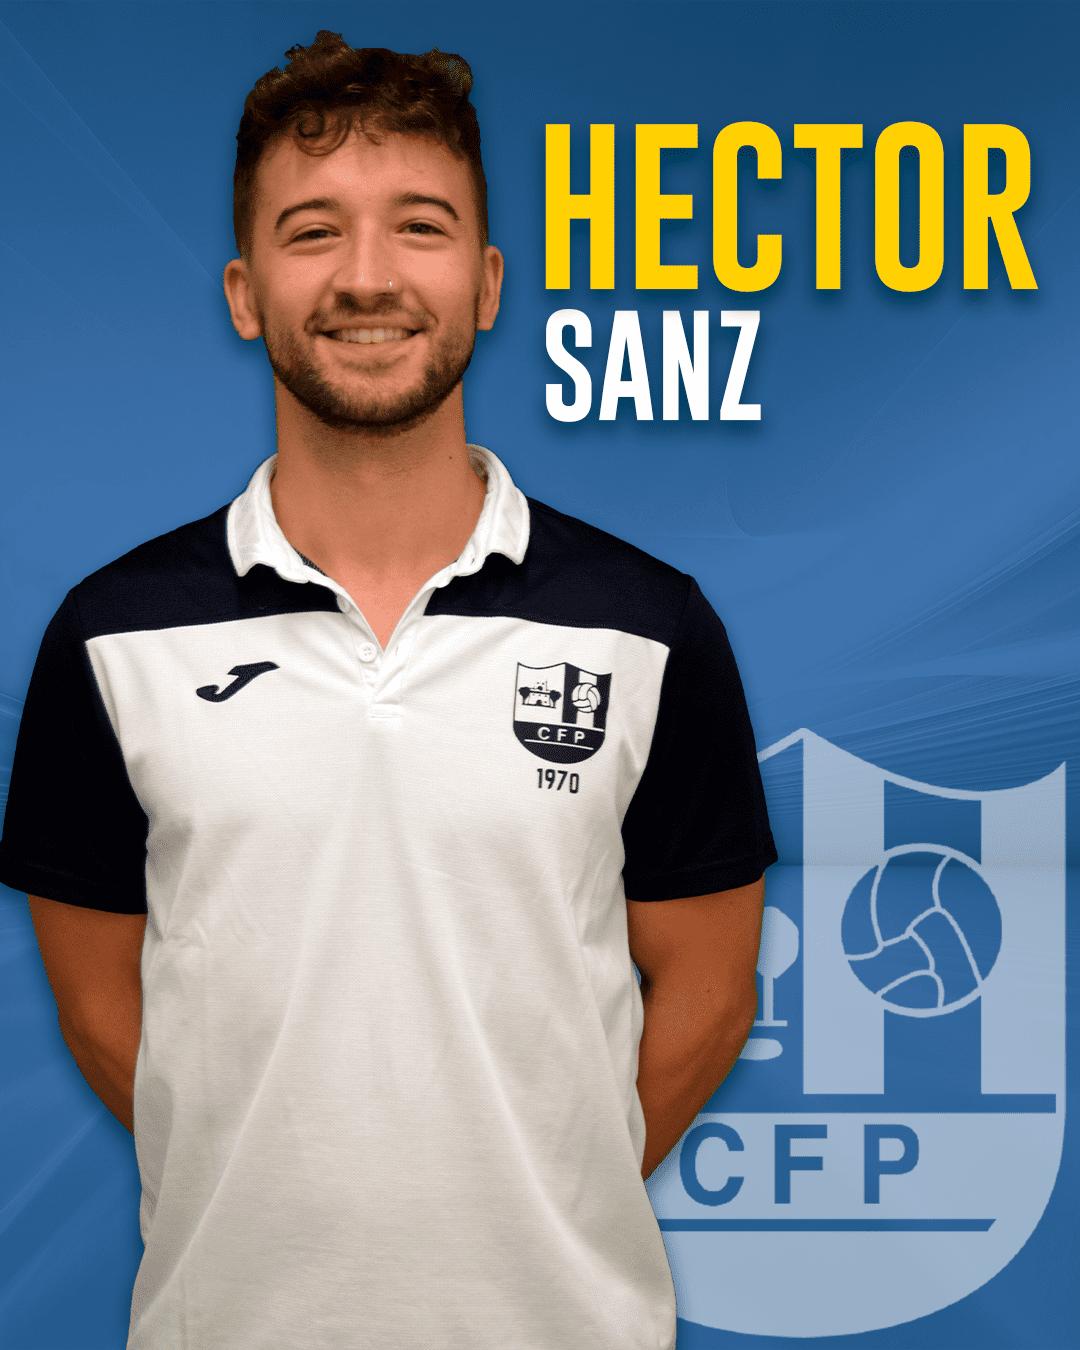 Héctor Sanz - Jugador del 1r equip masculí